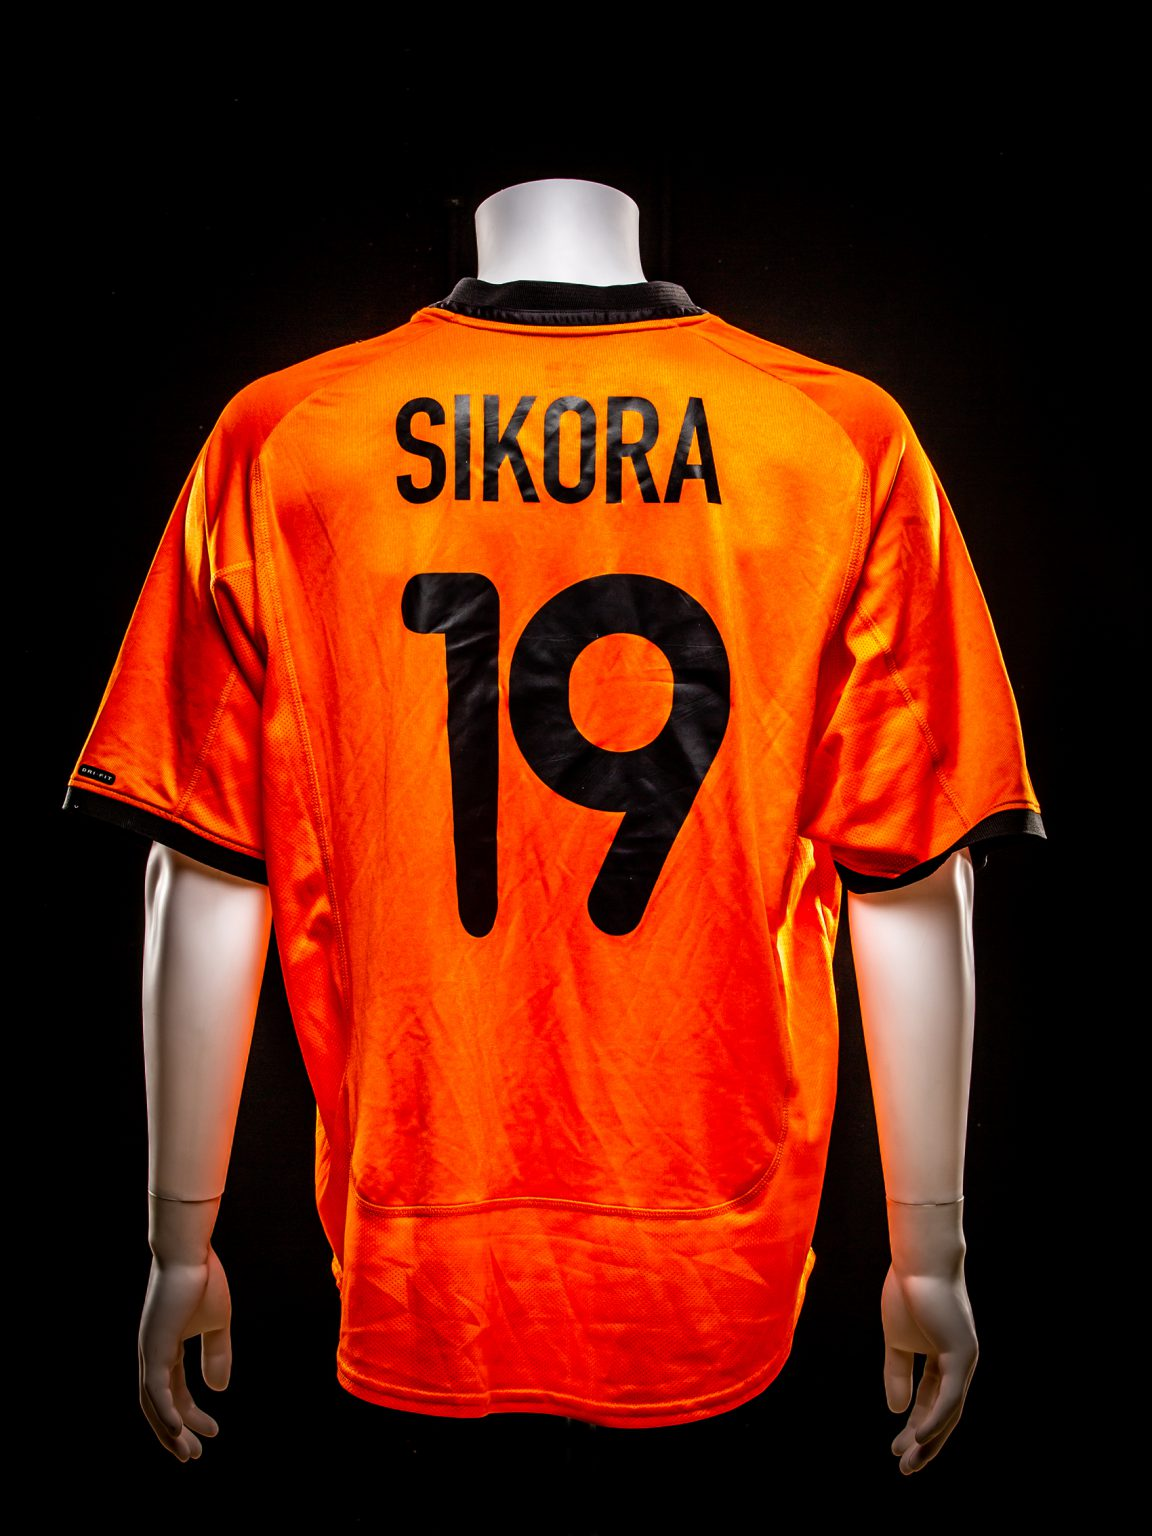 #19 Victor Sikora 2002